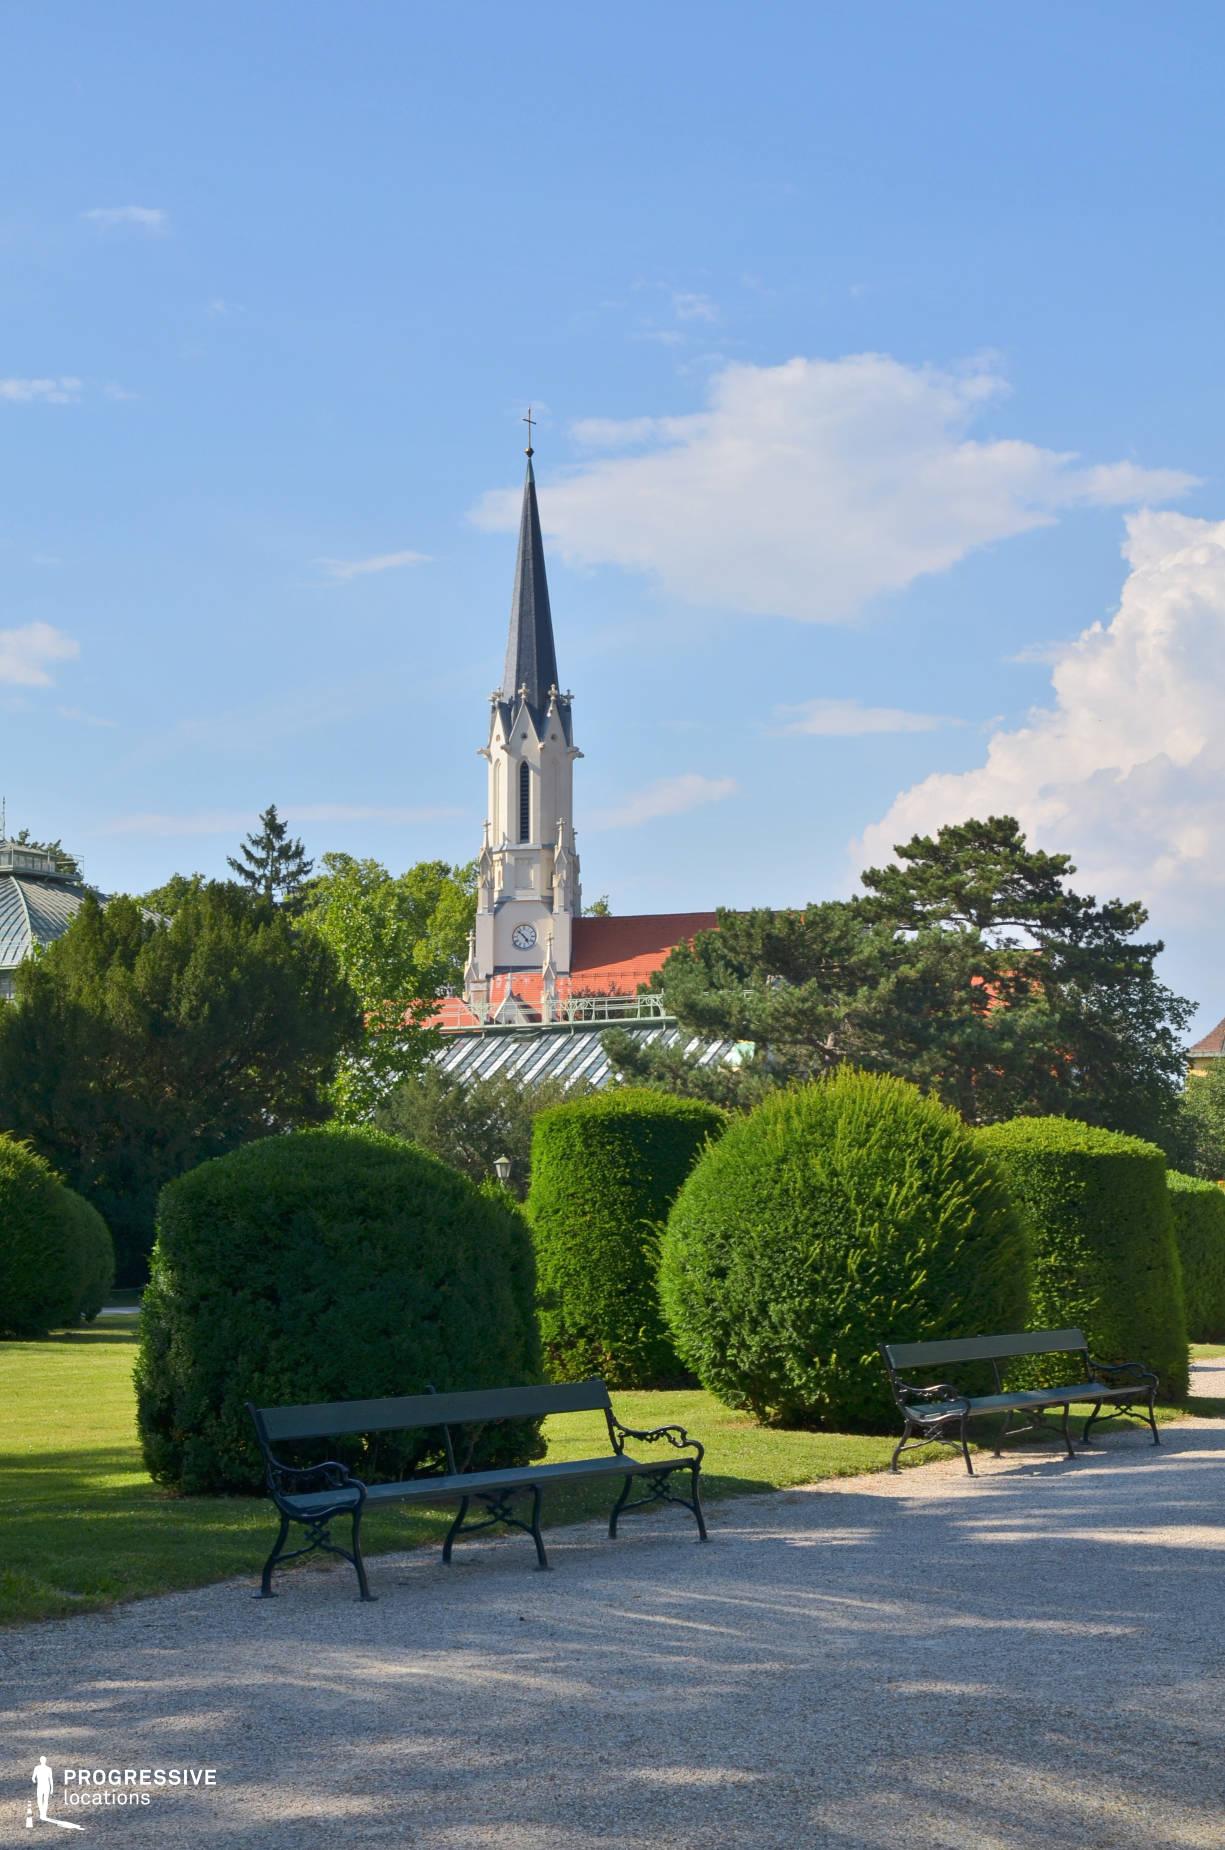 Locations in Austria: Garden %26 Curch, Schoenbrunn Palace